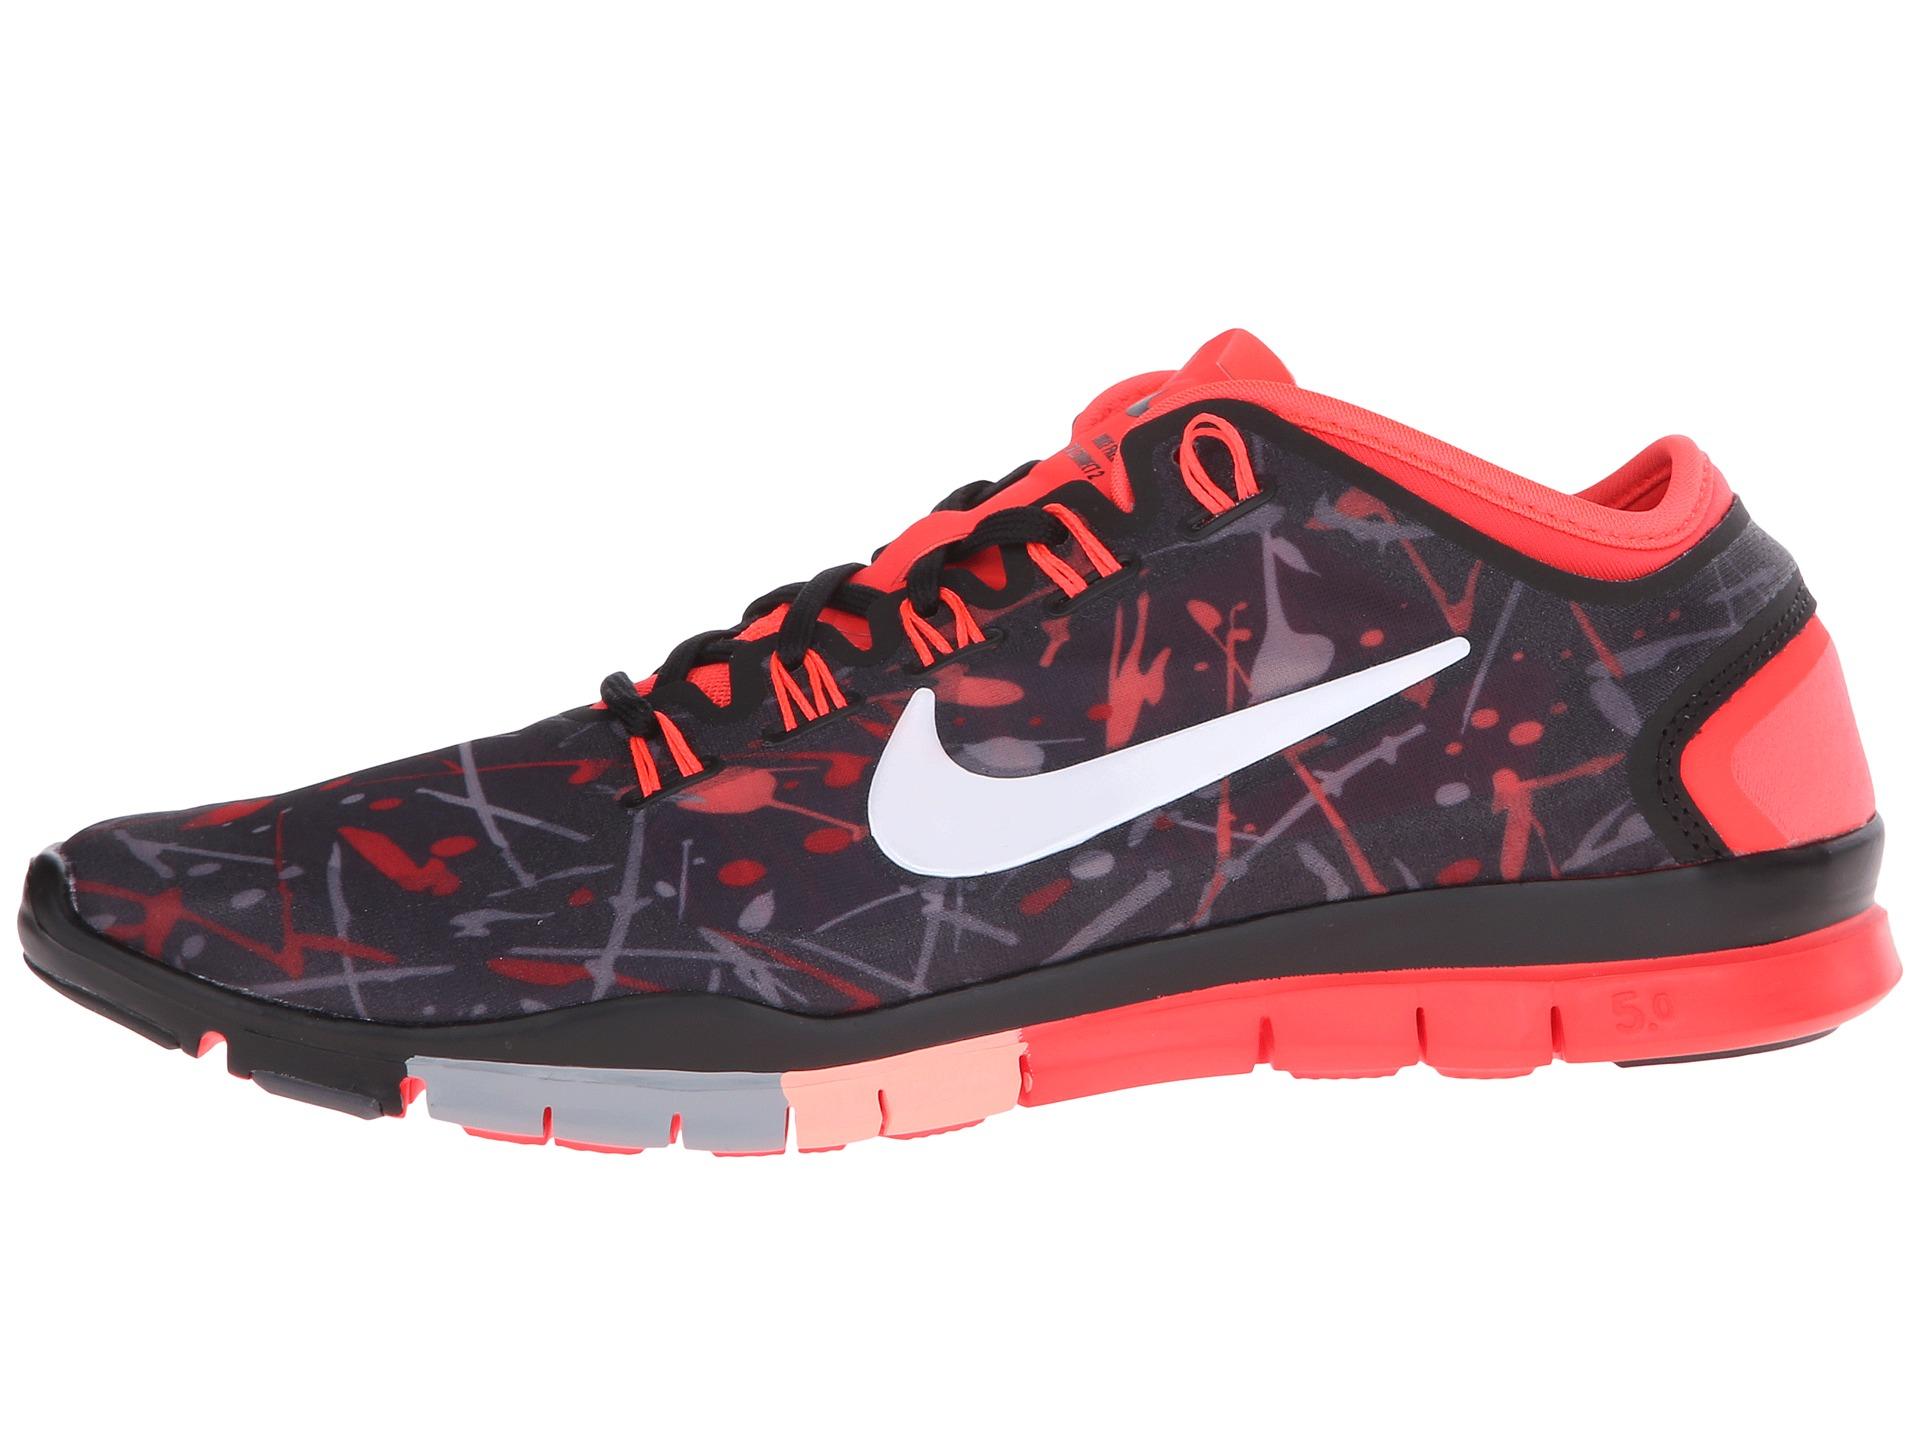 Nike Women's Free TR Connect 2 Training Shoe CheetahGreyBlack | DICK'S Sporting Goods